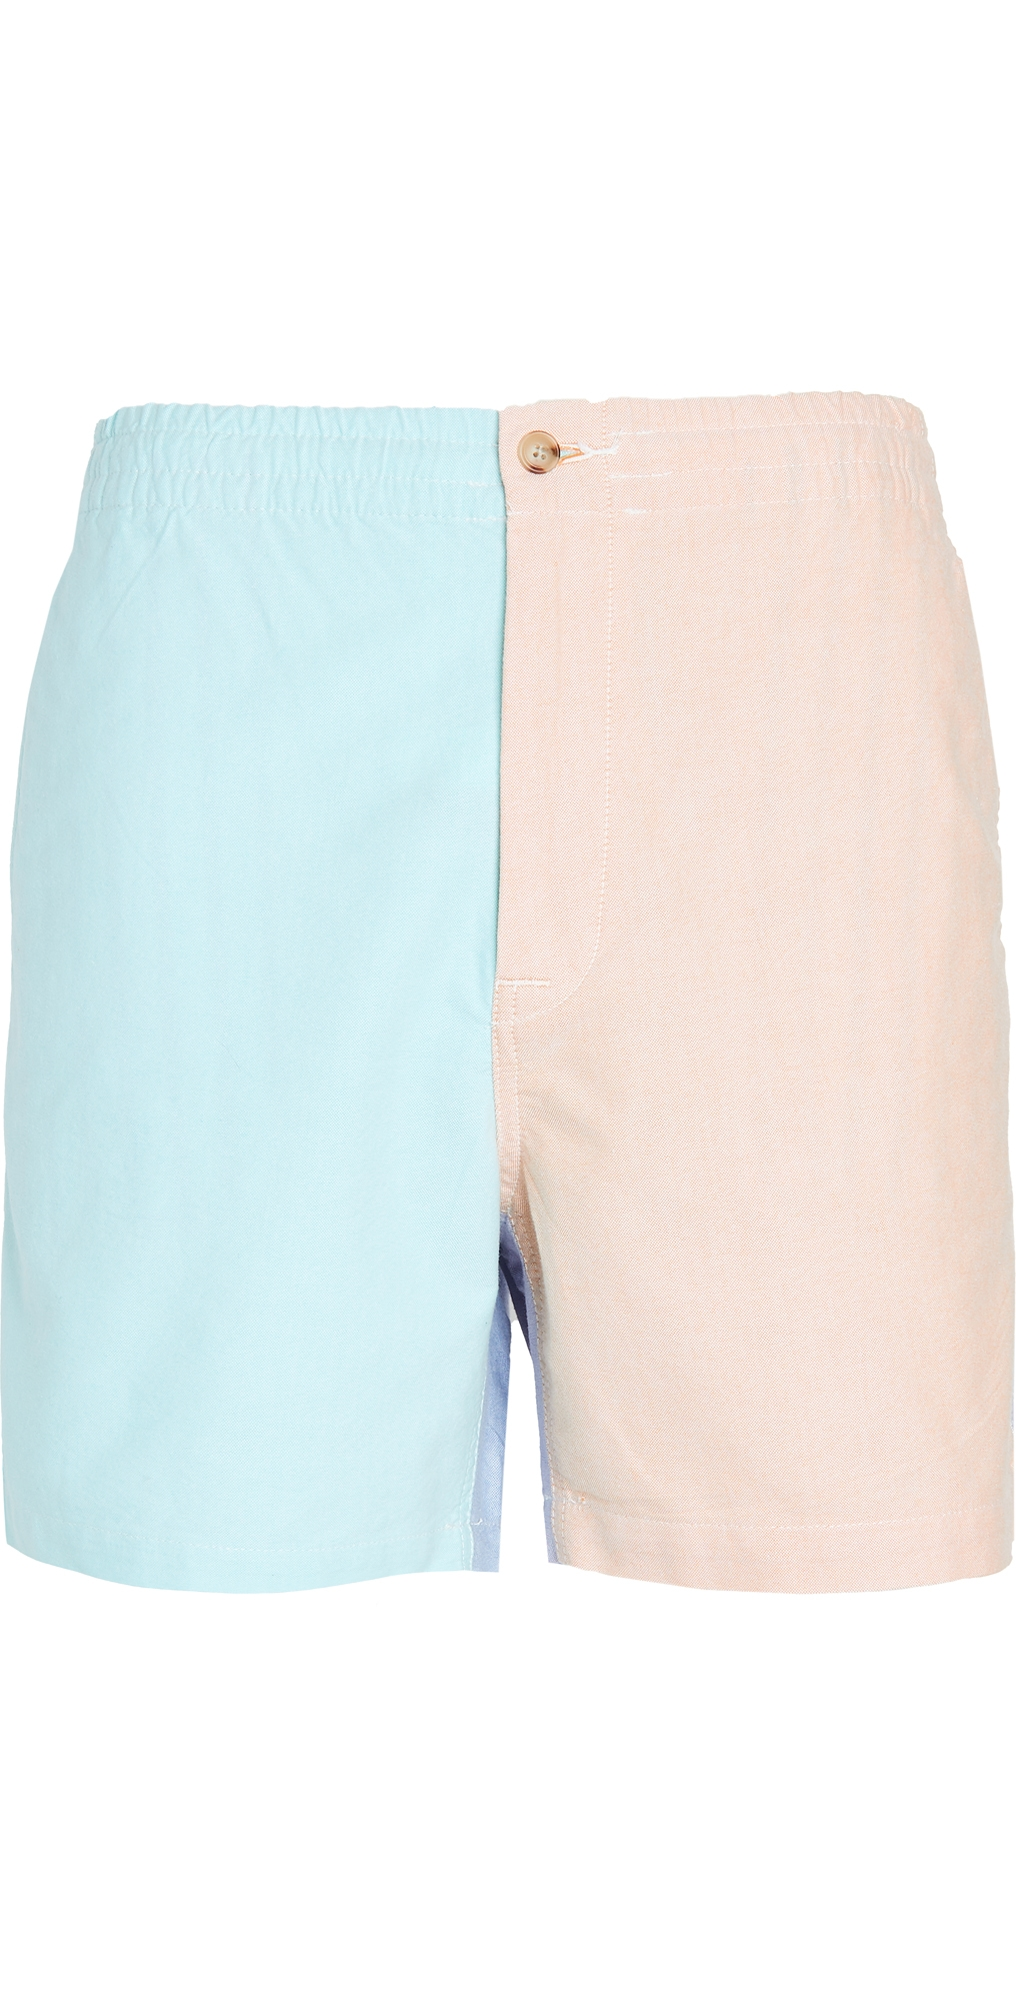 Polo Ralph Lauren Oxford Fun Prepster Shorts